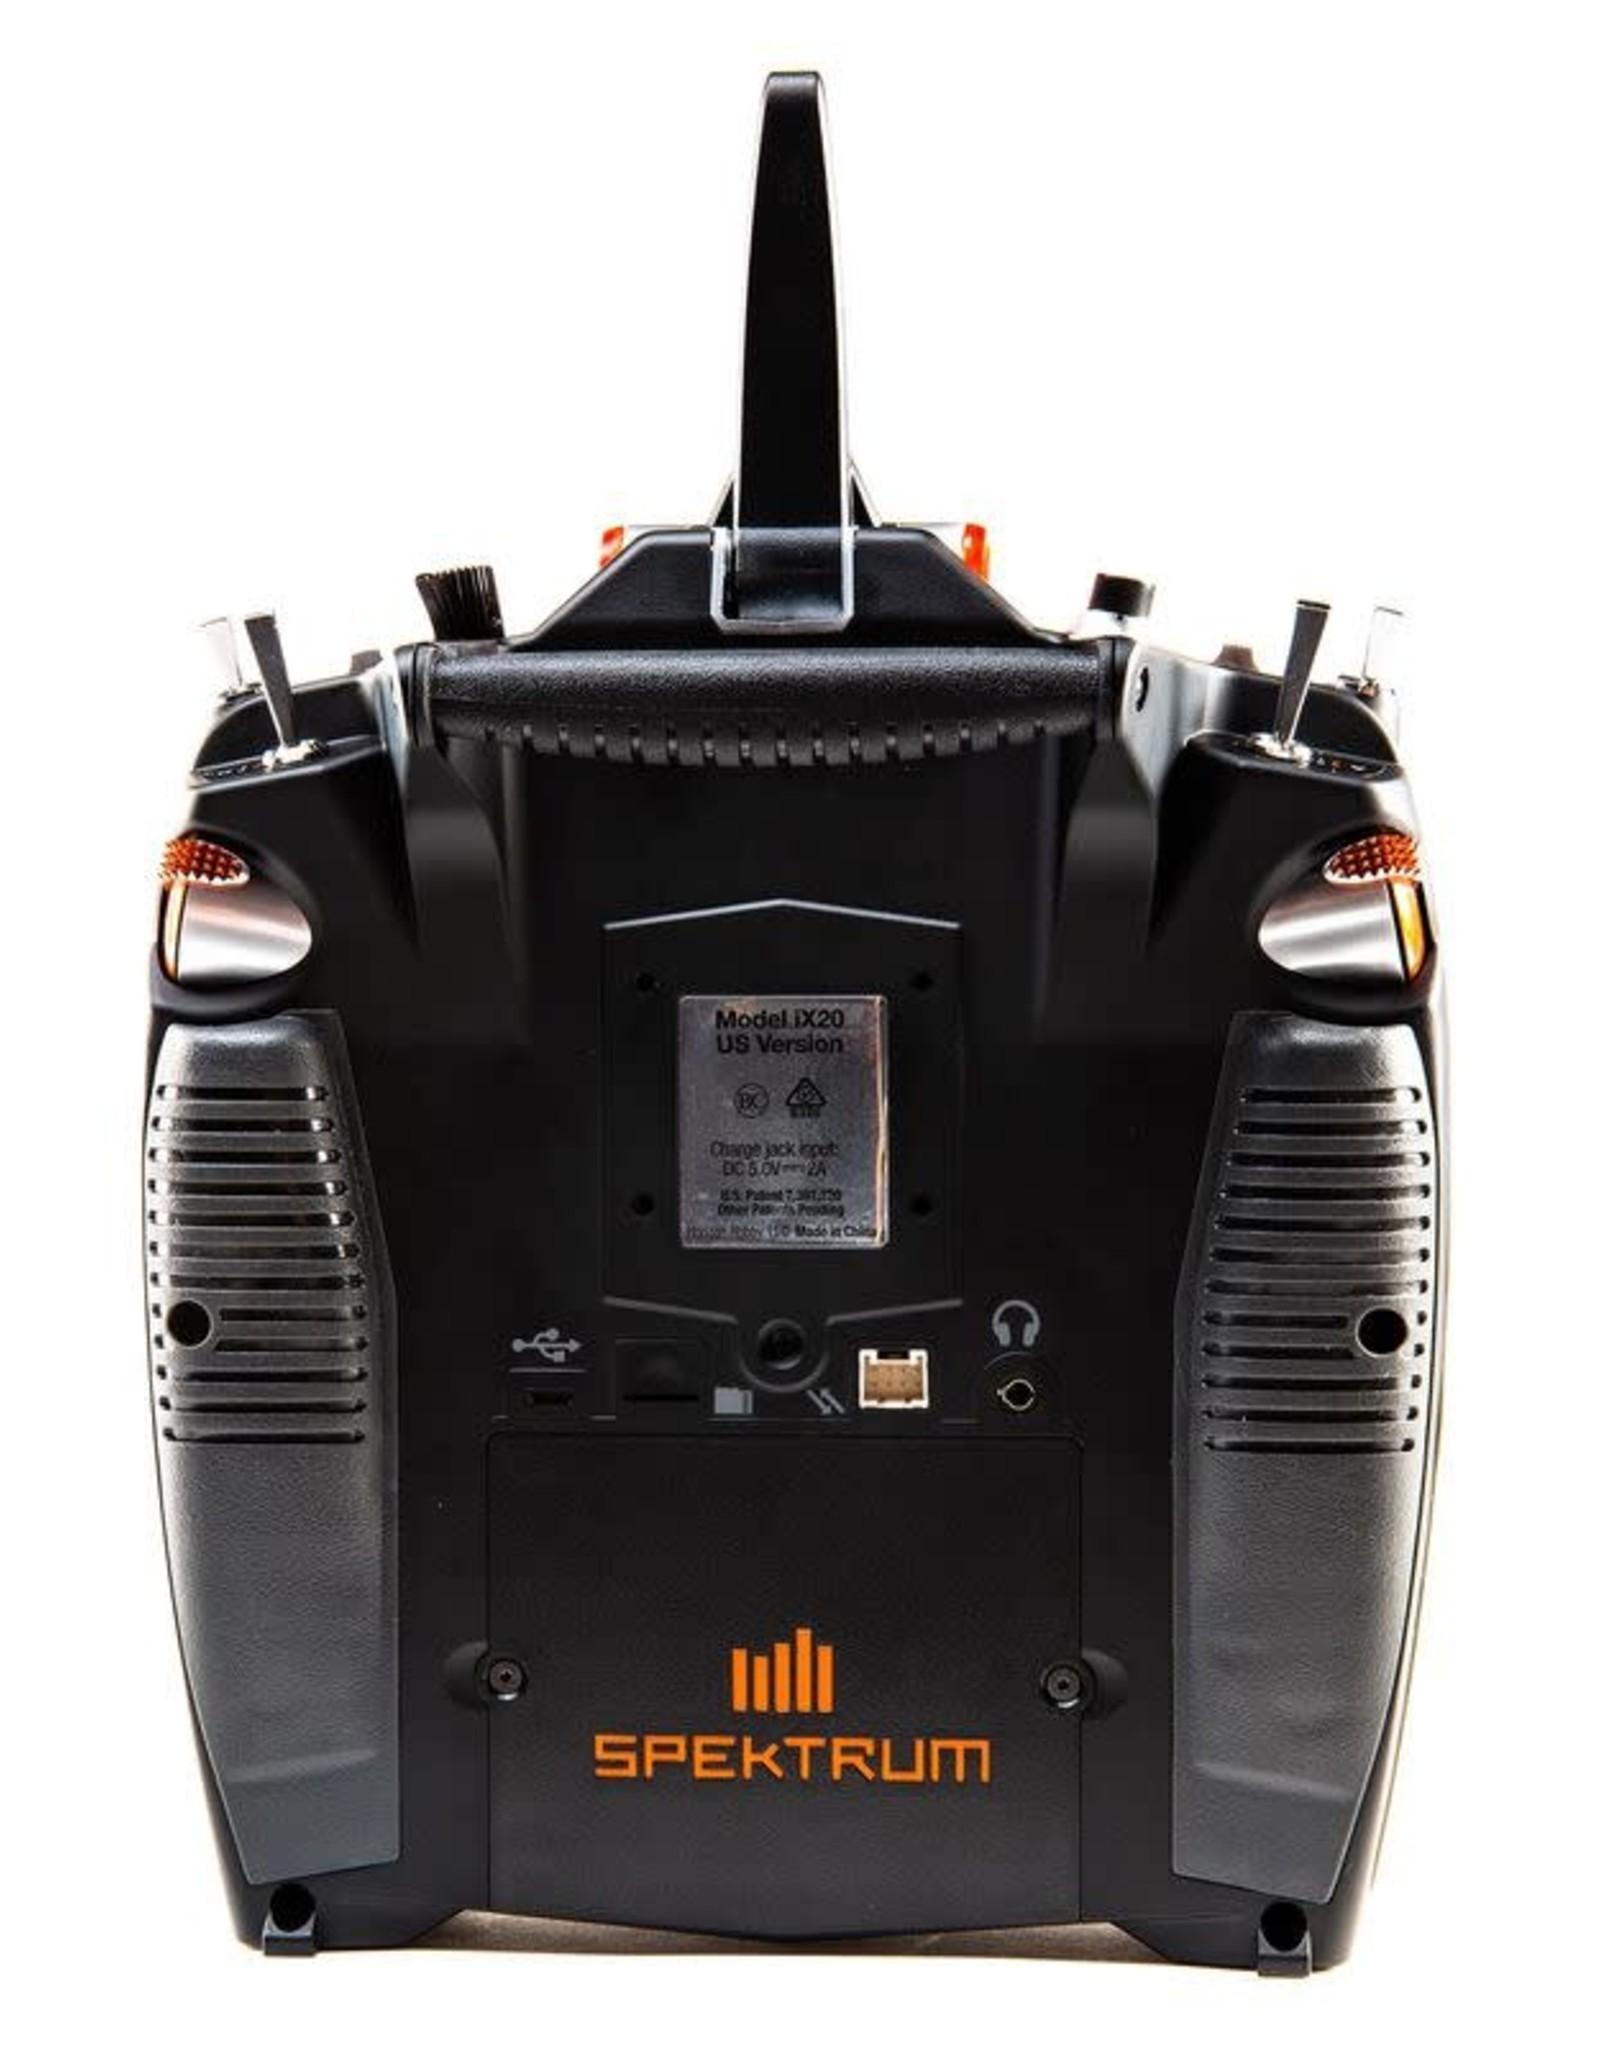 SPM SPMR20100 iX20 20-Channel DSMX Transmitter Only